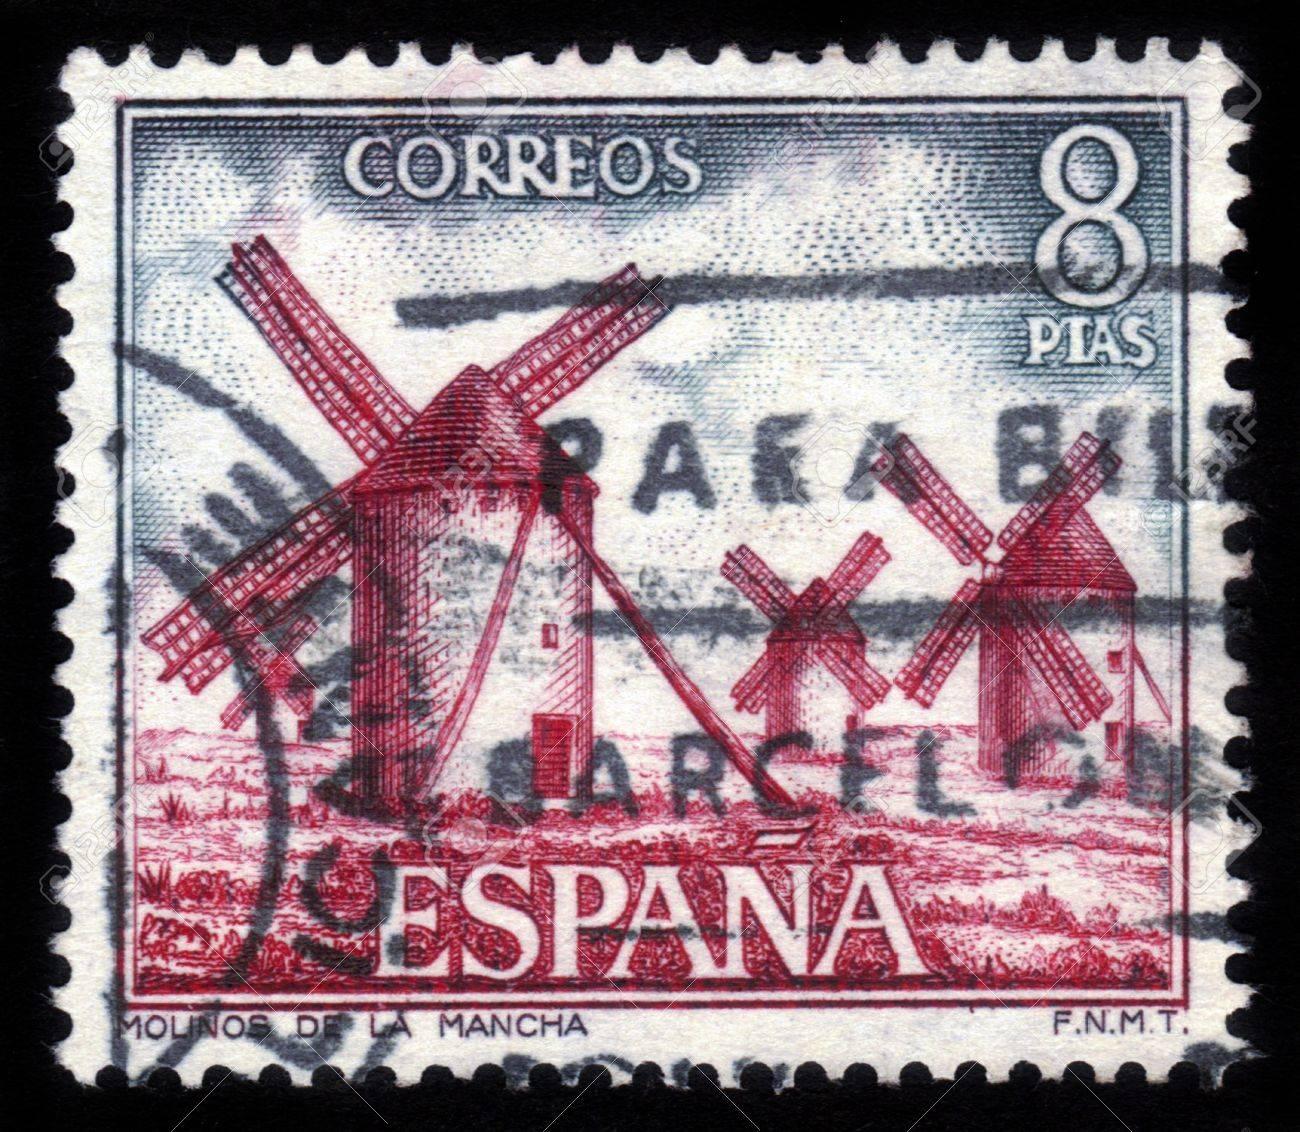 SPAIN - CIRCA 1973  A stamp printed by Spain, shows windmills of La Mancha  Spain , circa 1973 Stock Photo - 15132761